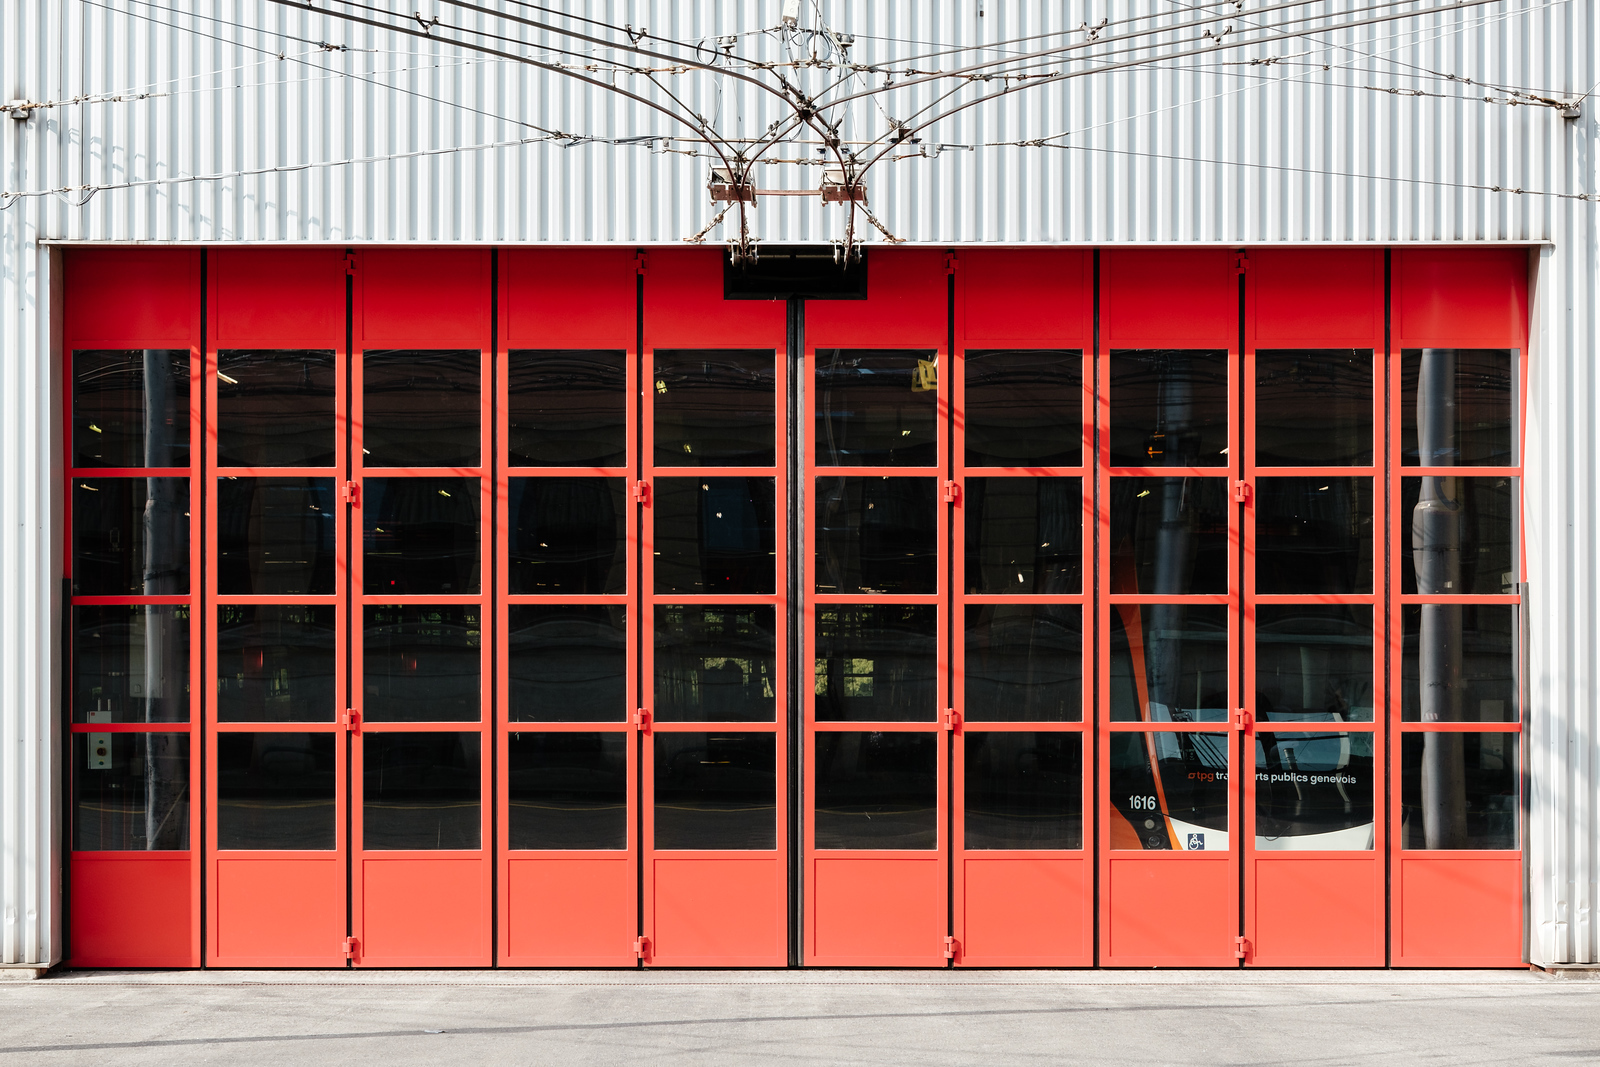 TPG trolley bus warehouse